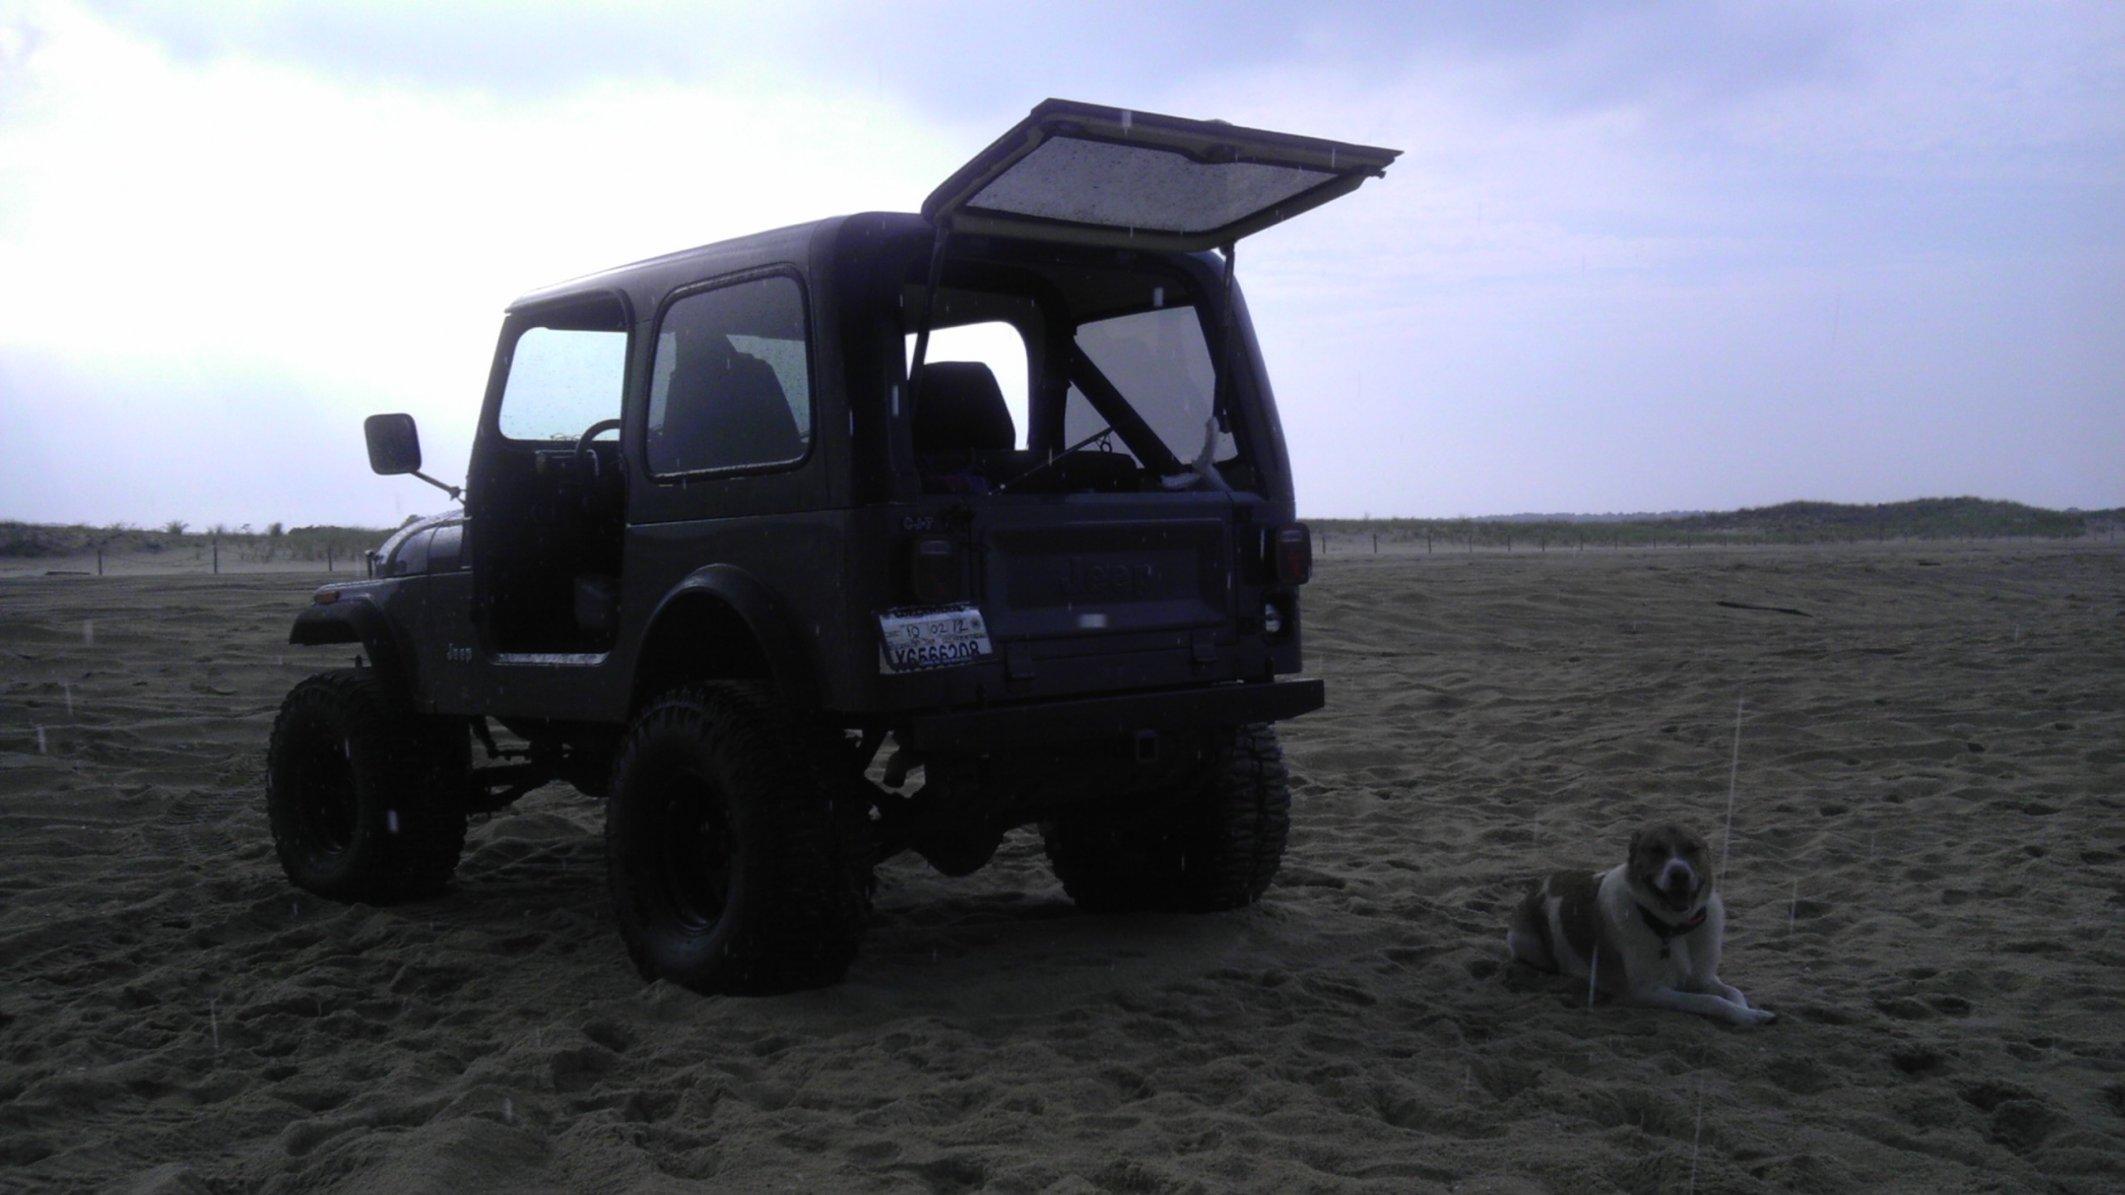 ry-cj-beach-aug-2012.jpg